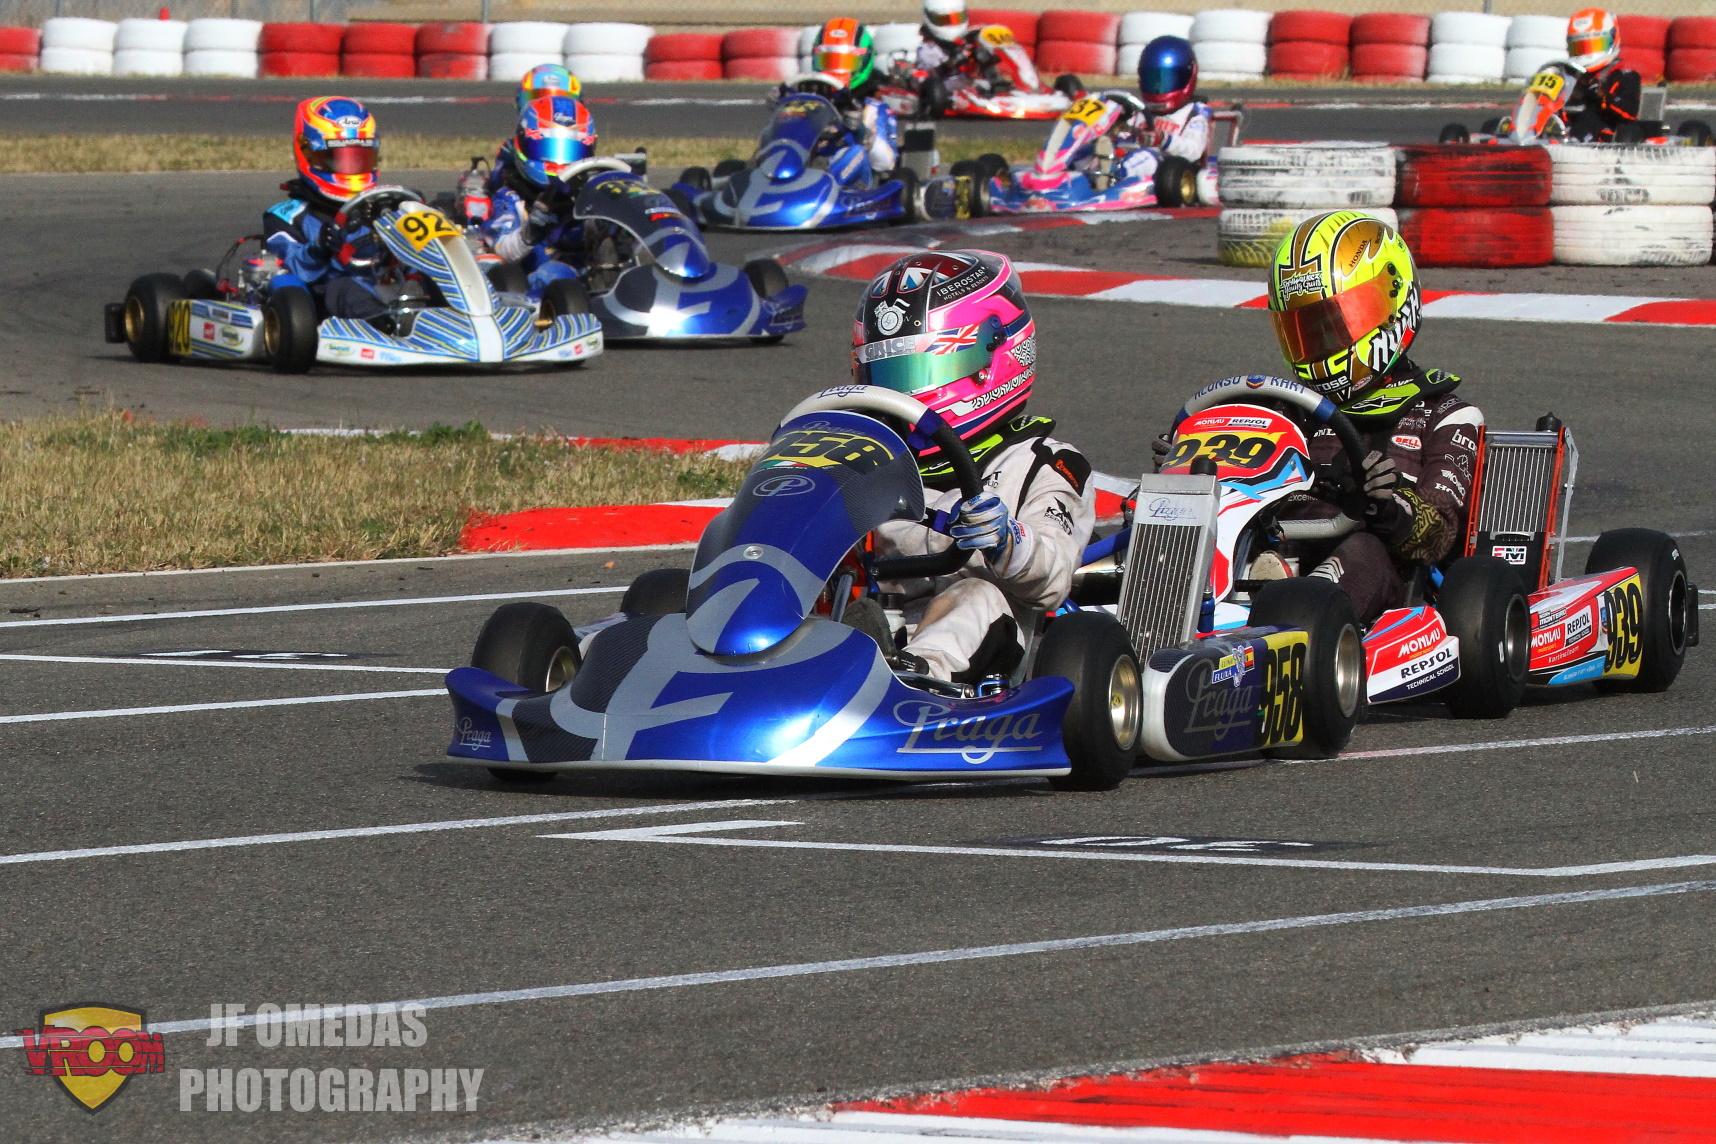 Iame Winter Cup: Qualifying optimista para los pilotos españoles